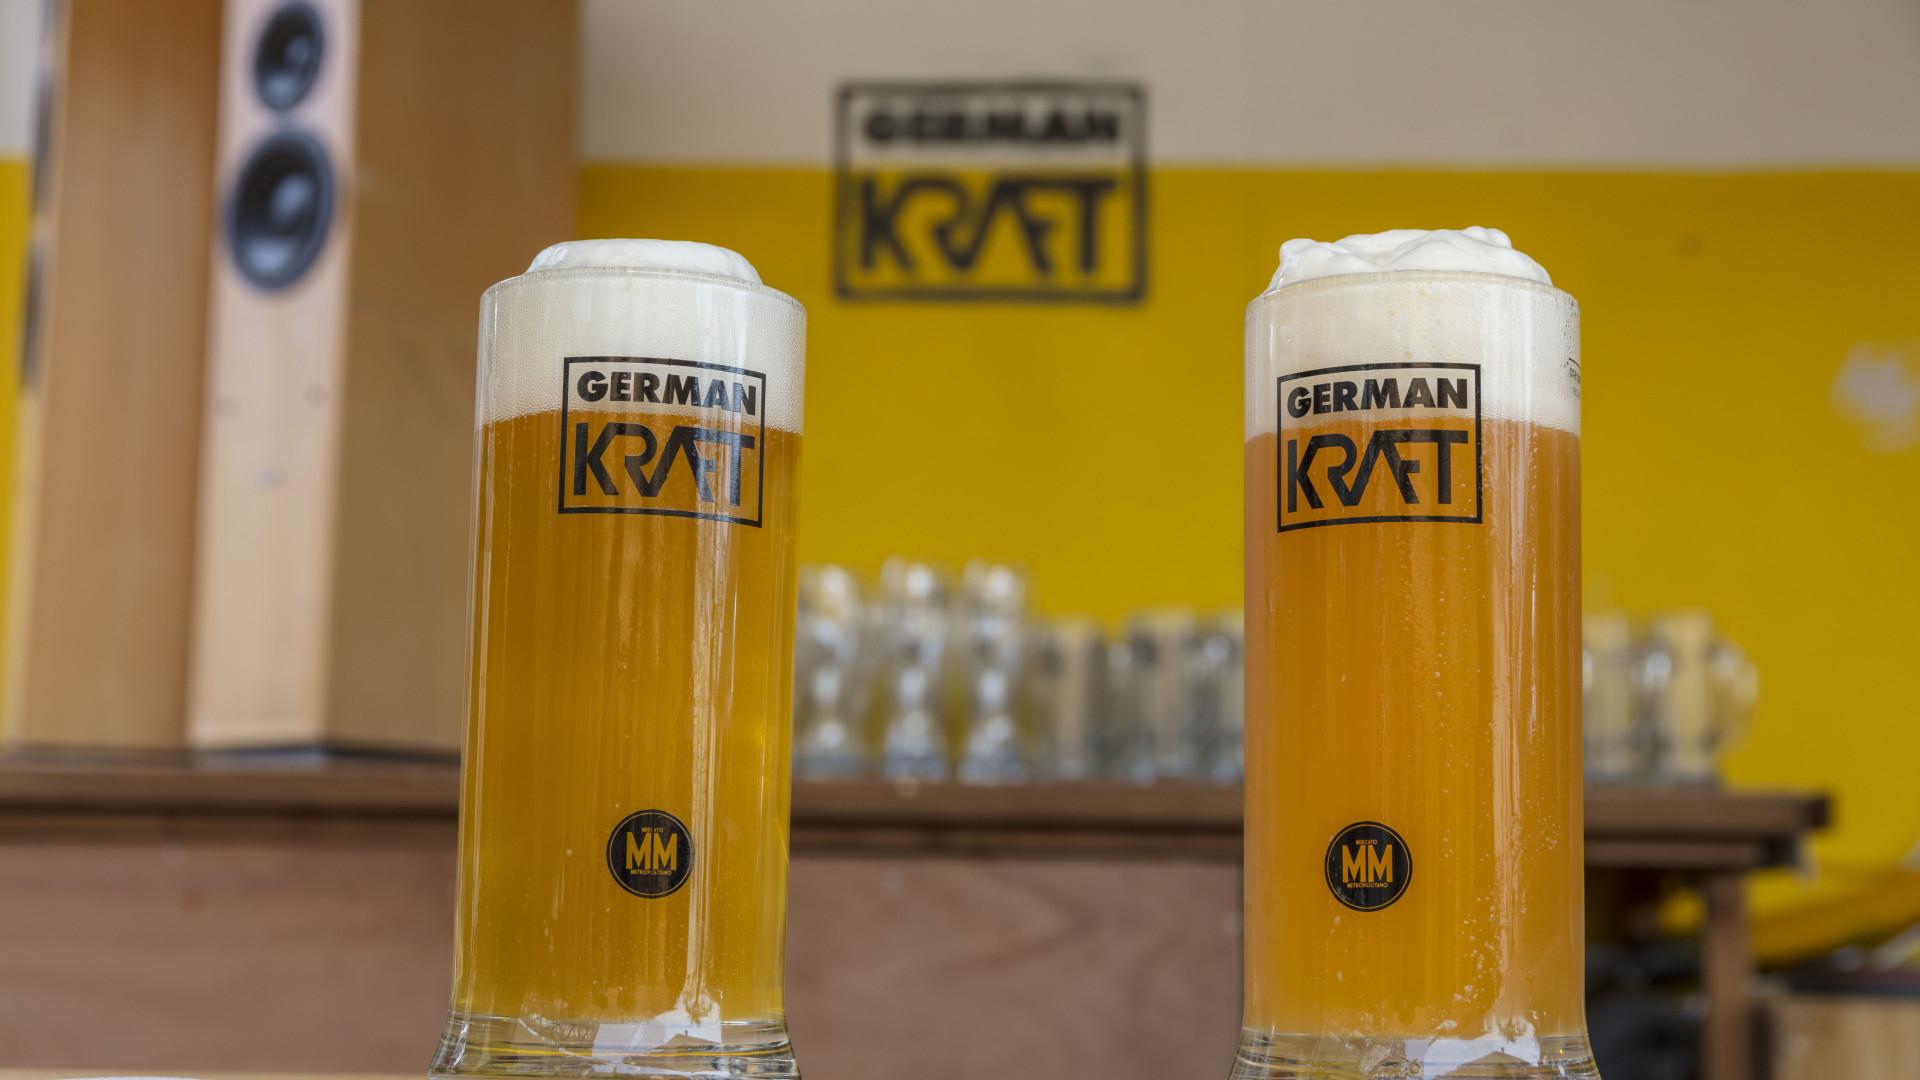 Pints at German Kraft brewer